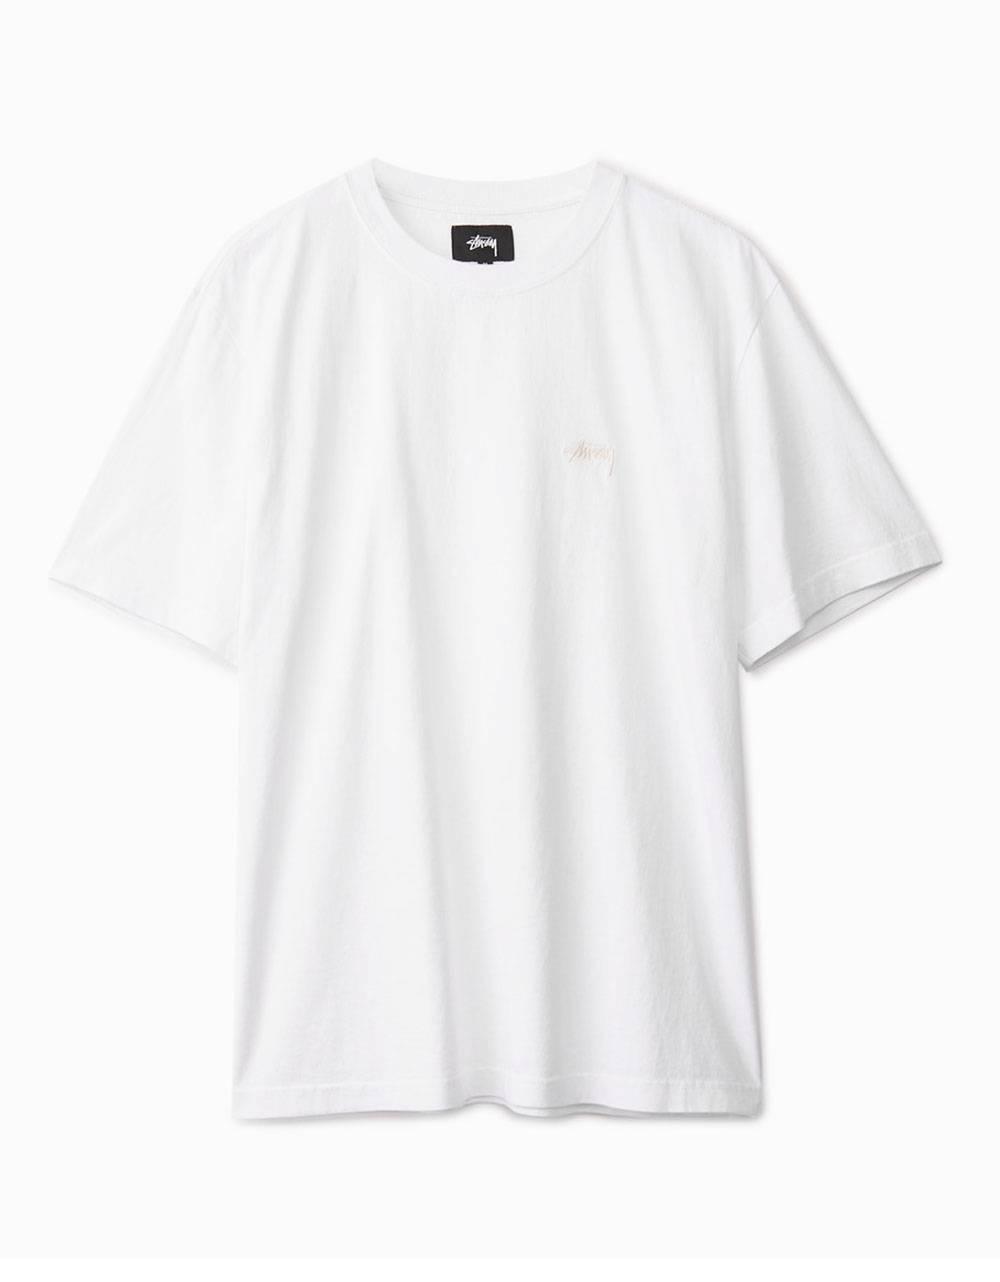 Stussy Stock logo crew tee - natural Stussy T-shirt 57,38€